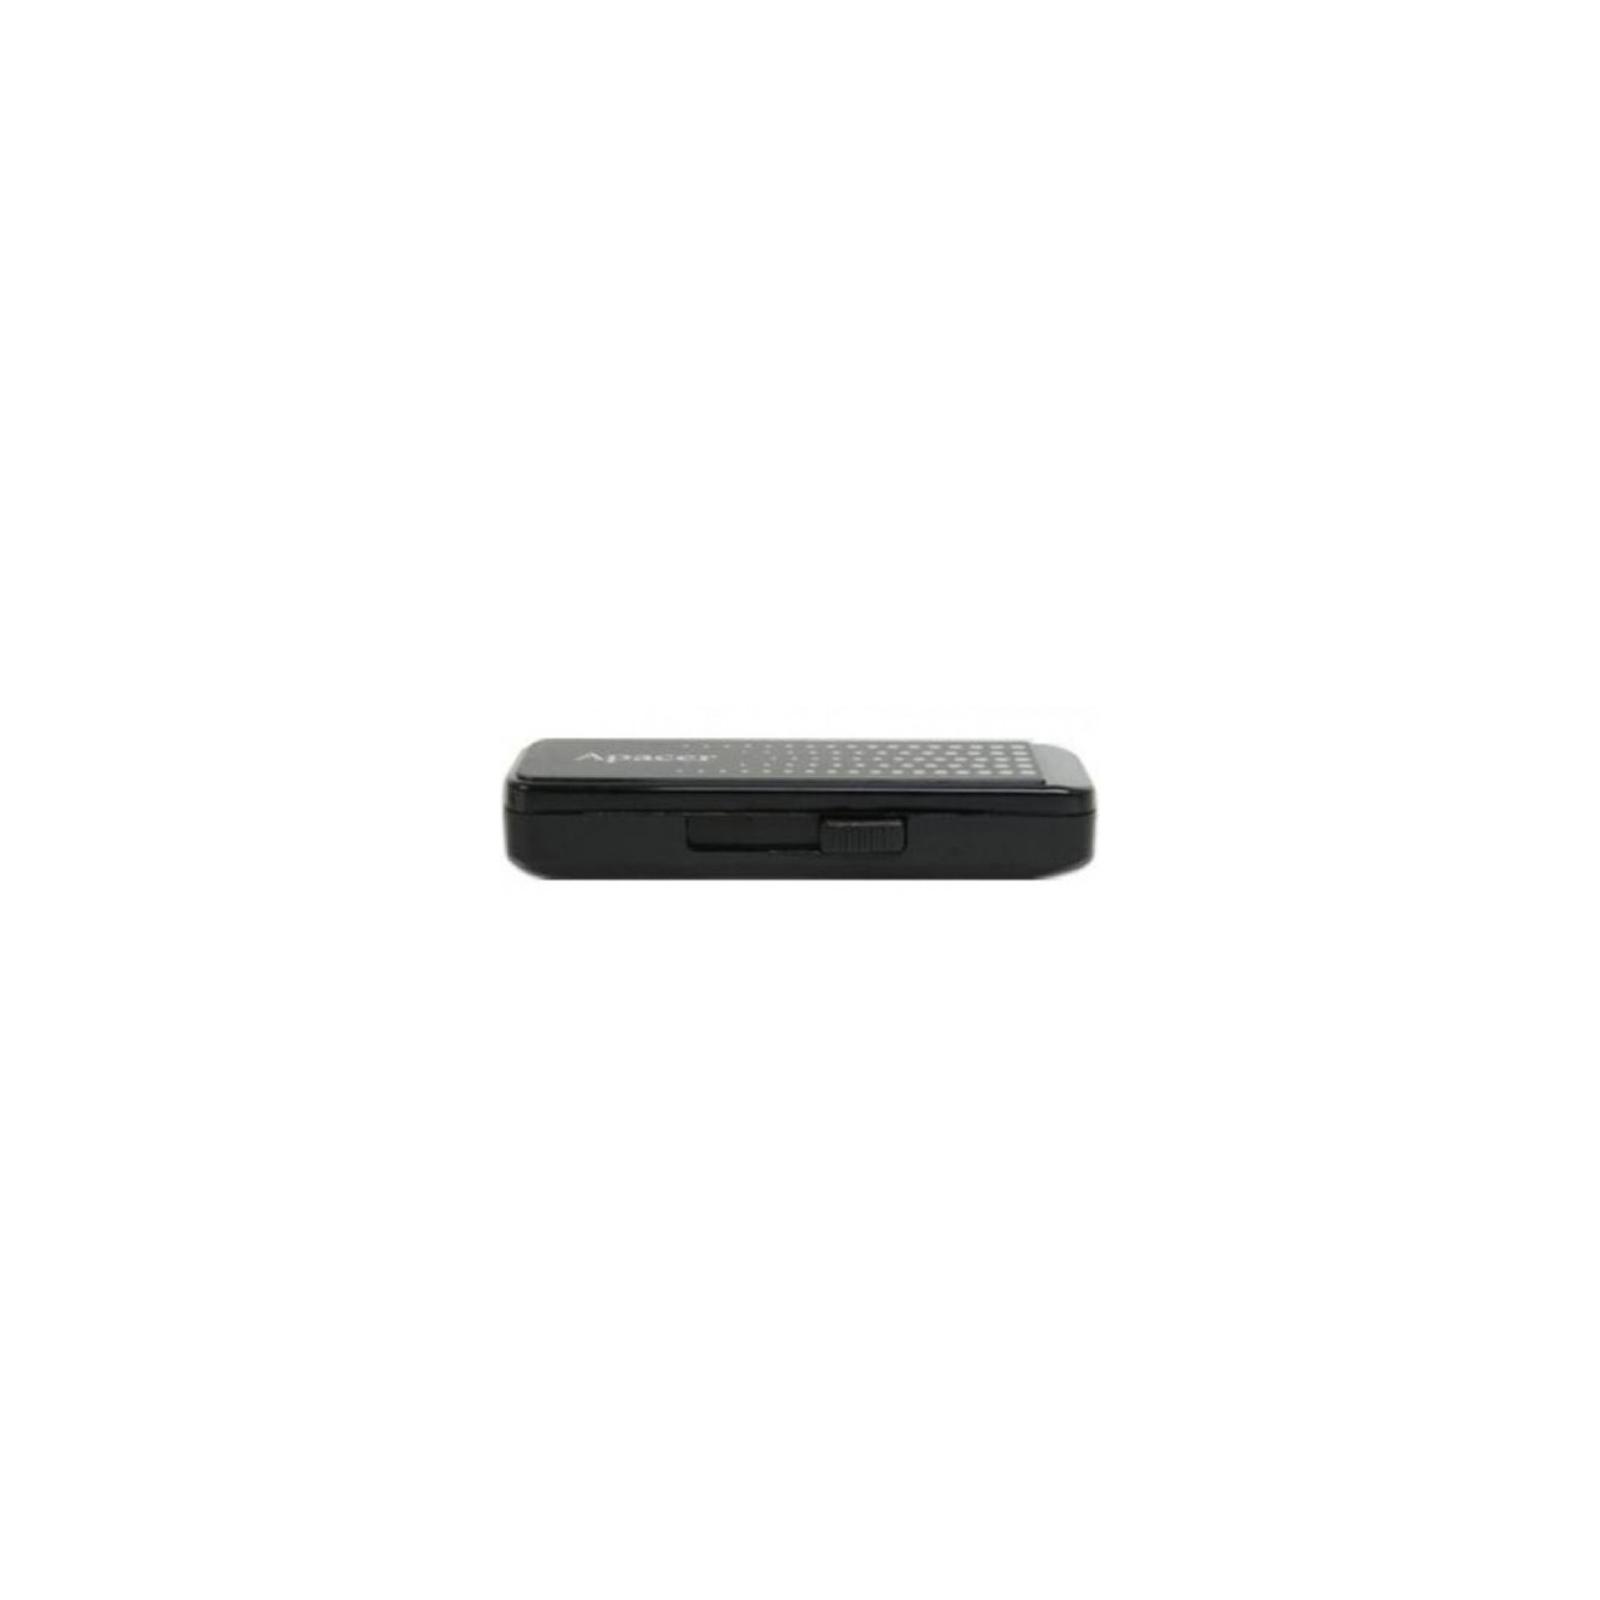 USB флеш накопитель Handy Steno AH323 black Apacer (AP16GAH323B-1) изображение 4